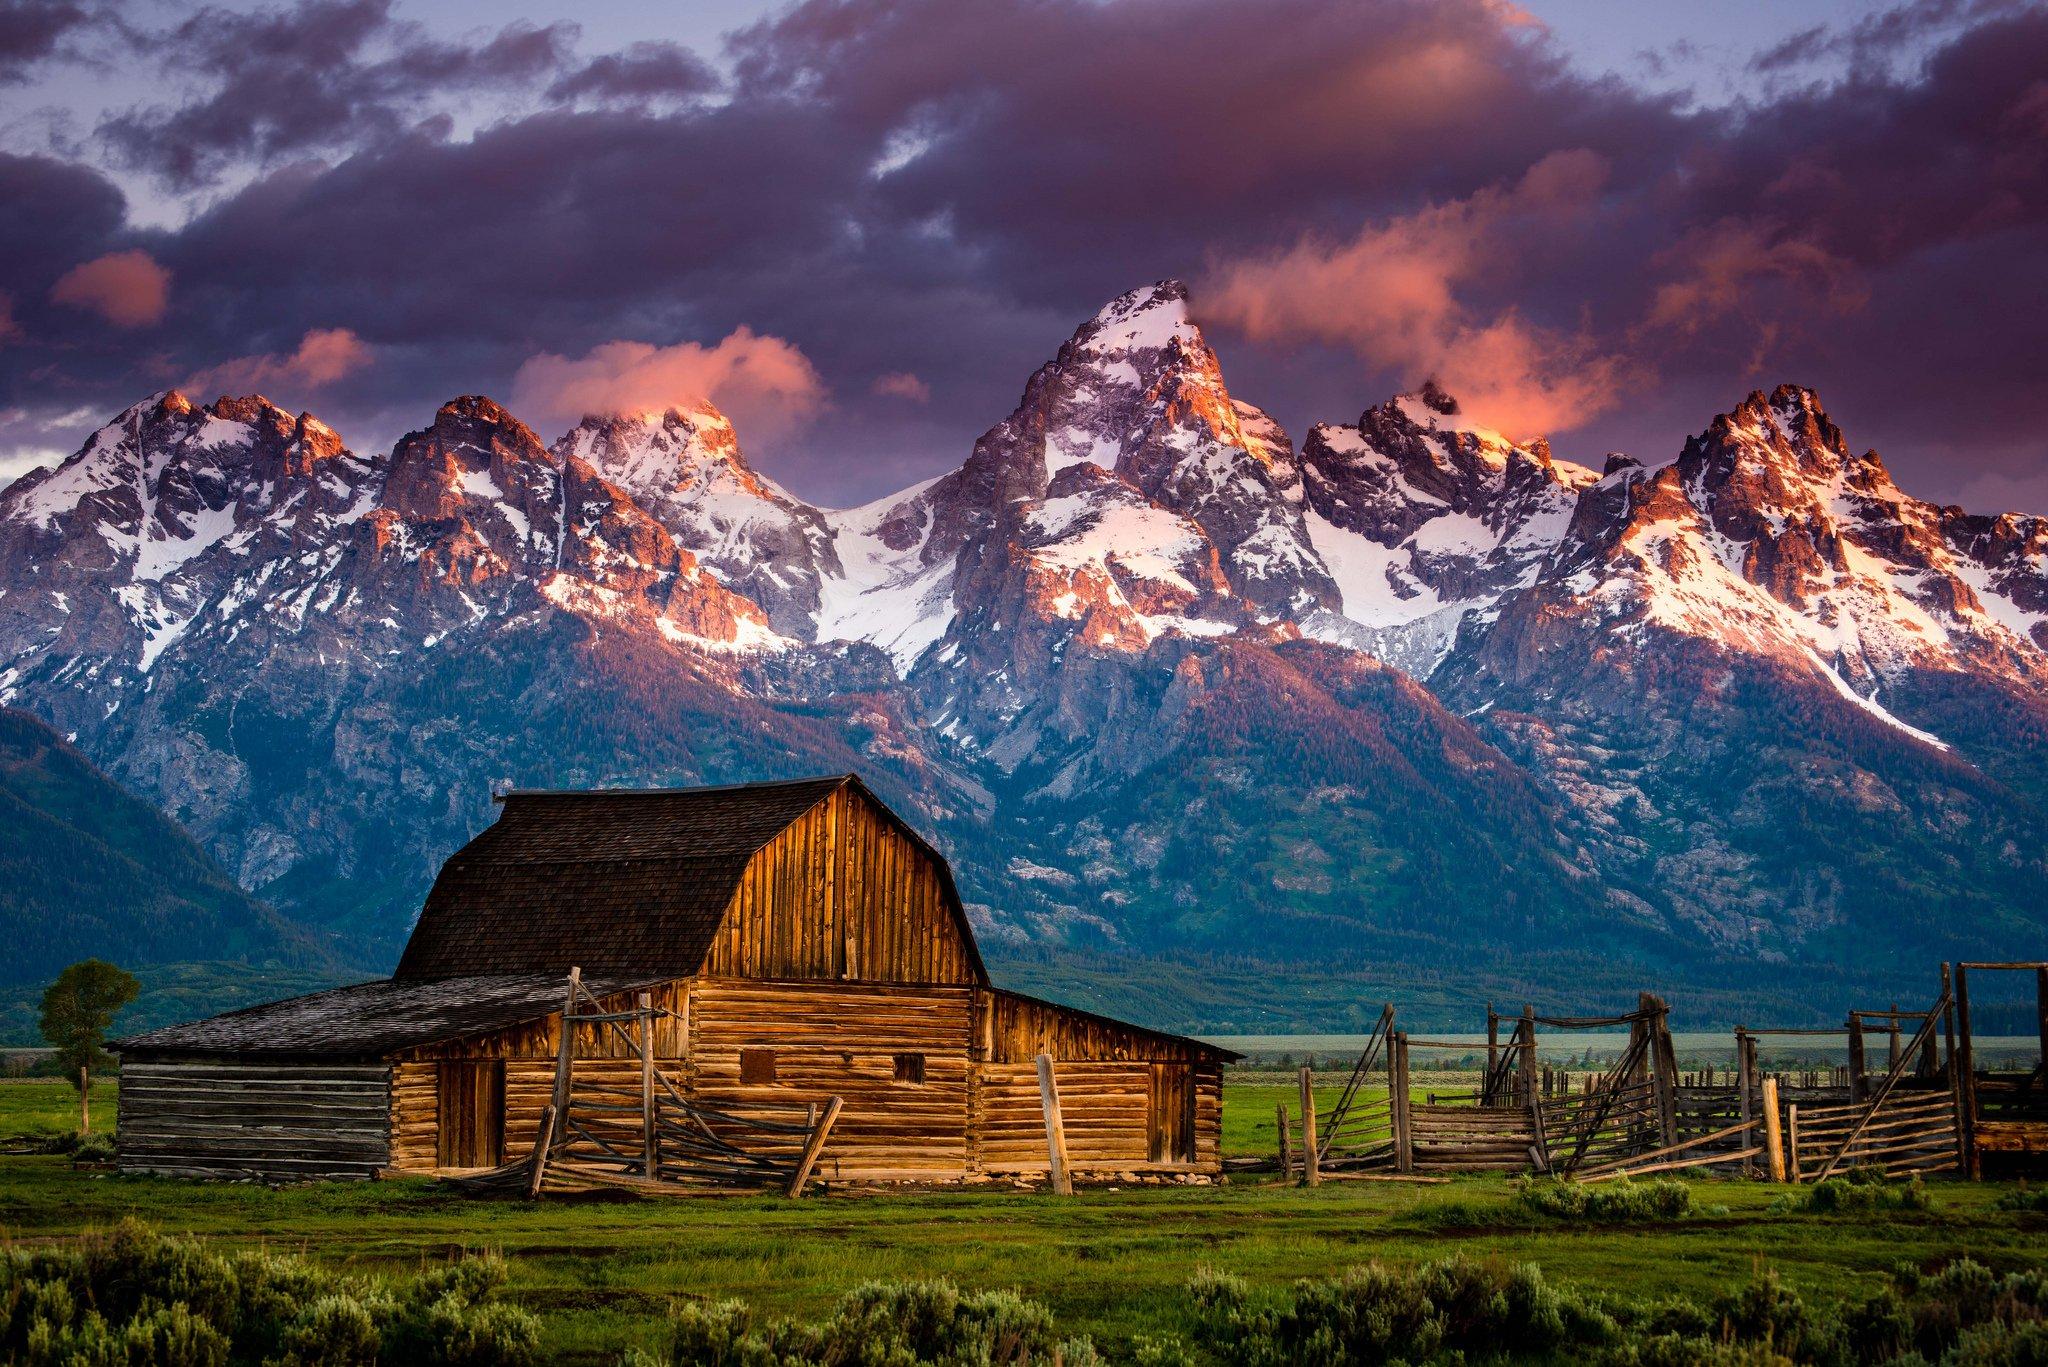 Farm barn rustic sunset sunrise mood mountain wallpaper 2048x1367 2048x1367